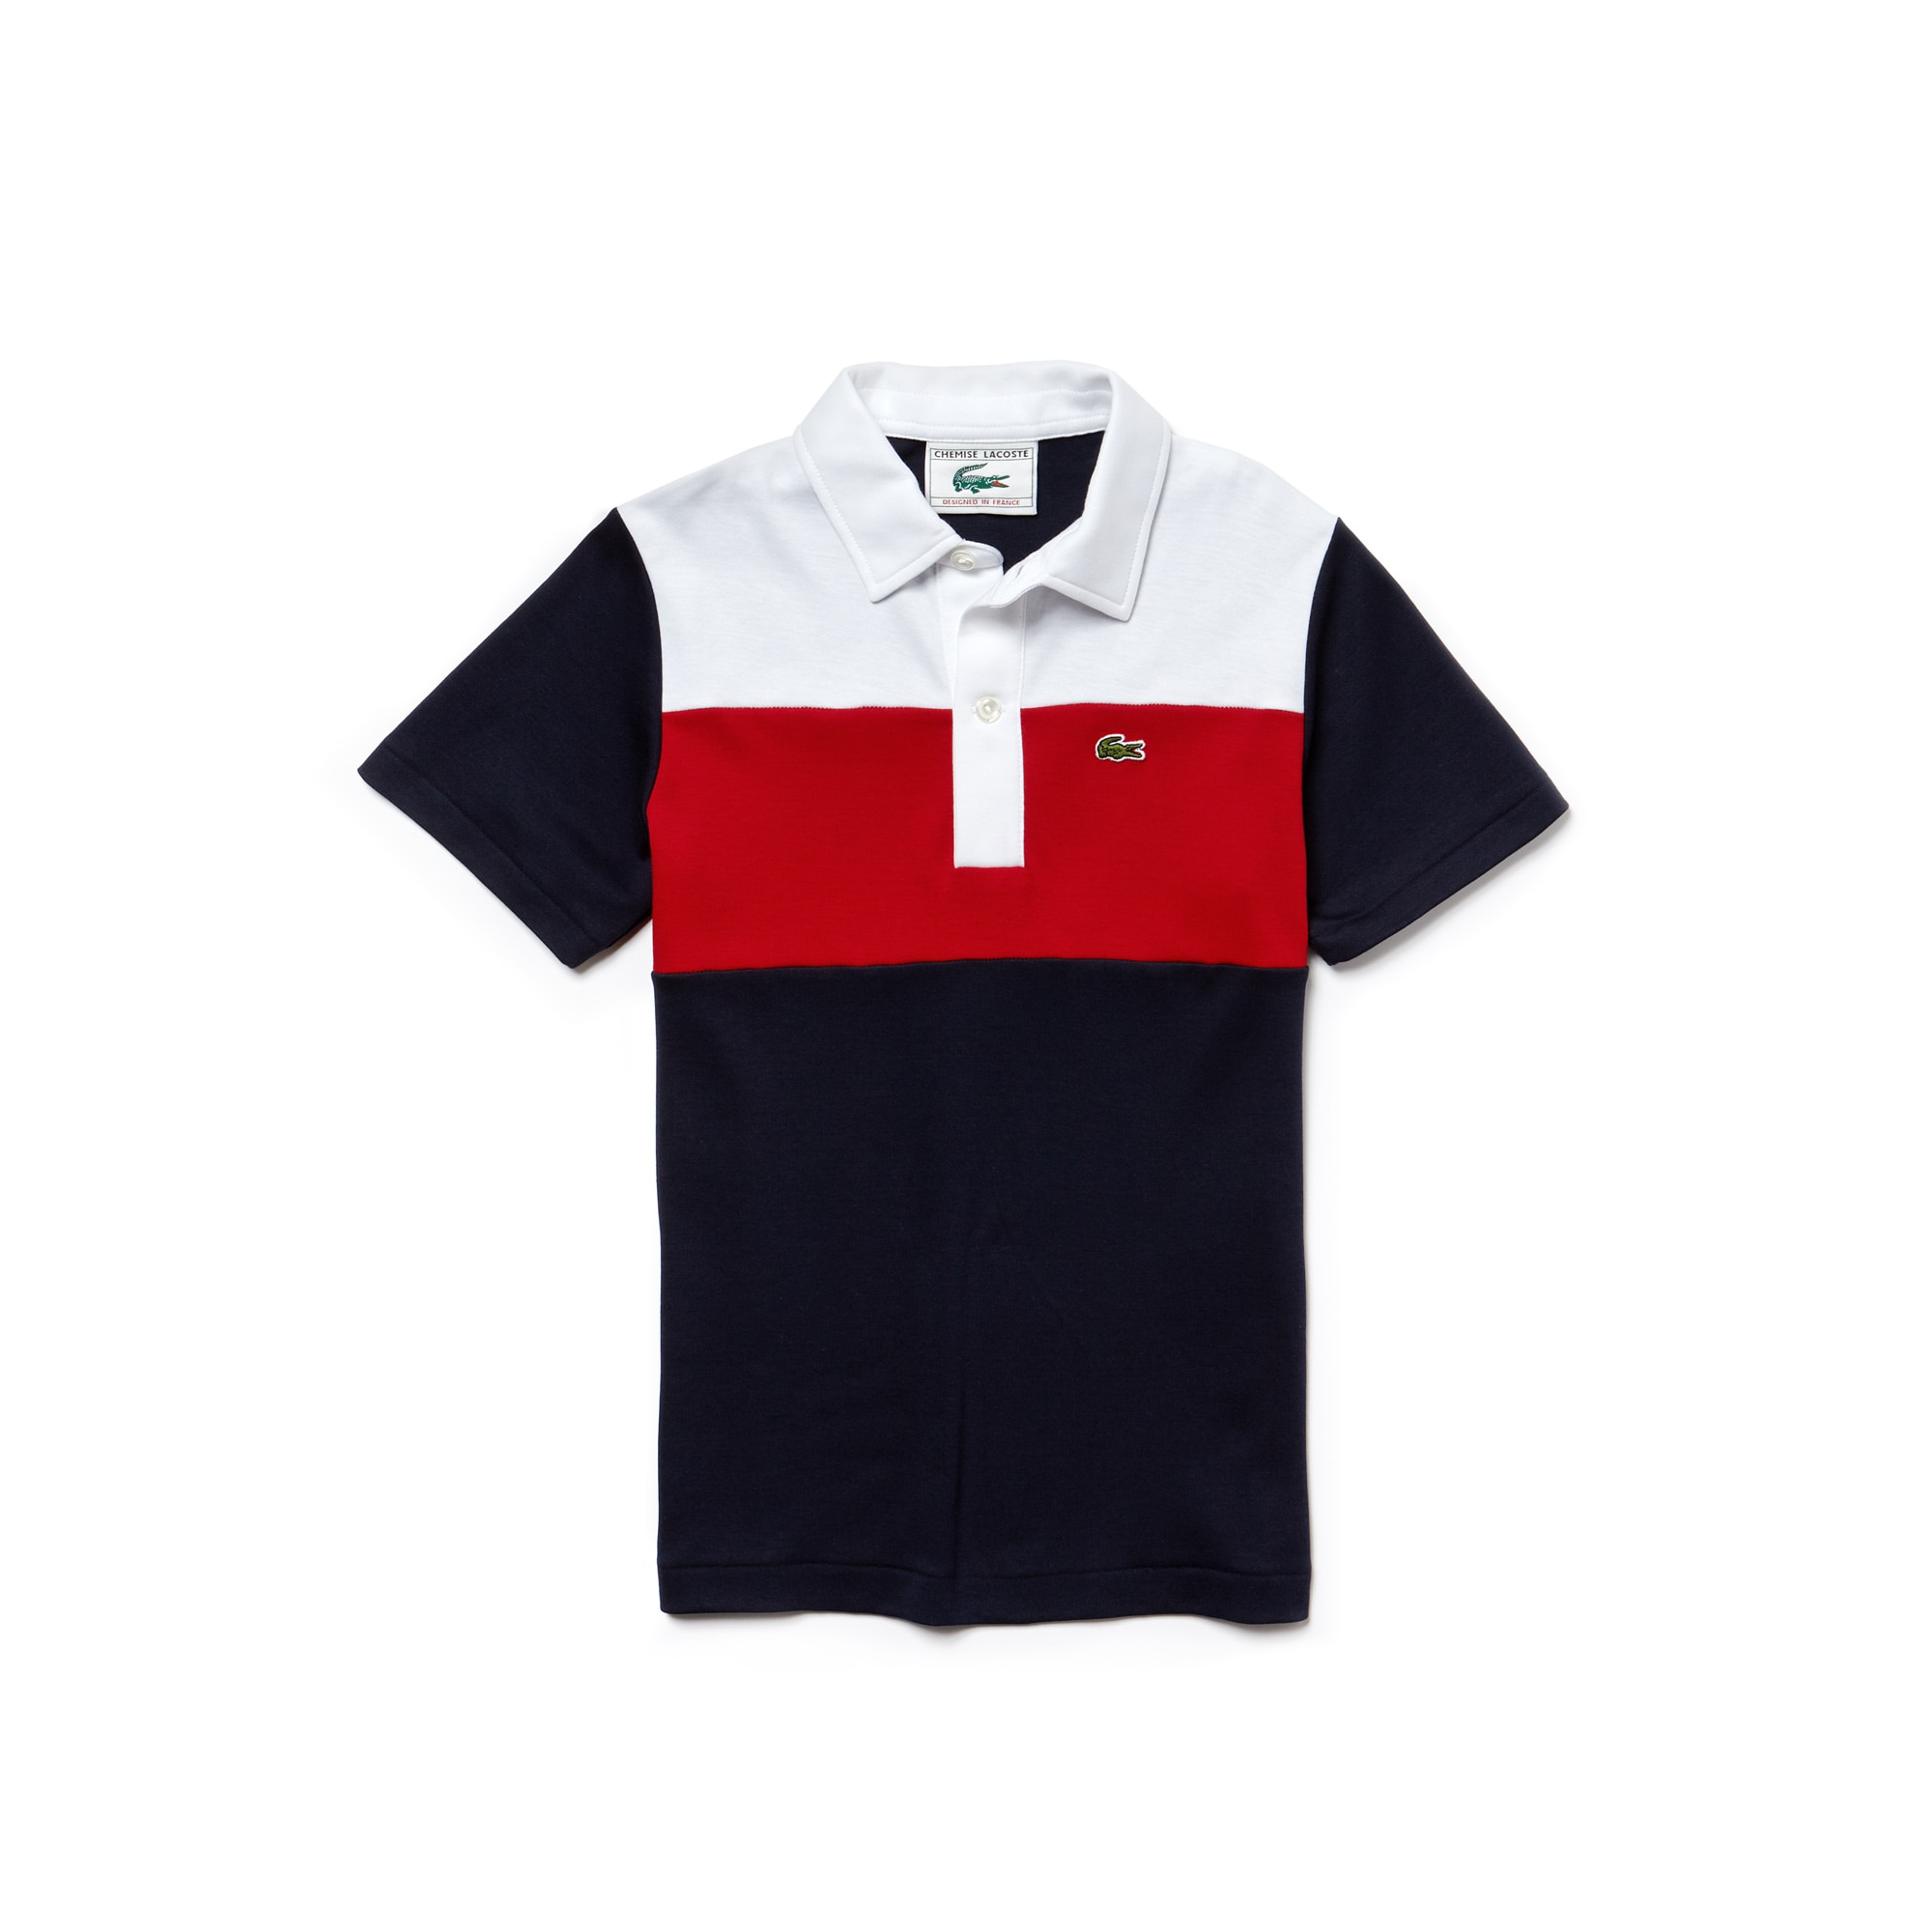 Boys' Lacoste 1970s revival 85th Anniversary Limited Edition Interlock Polo Shirt